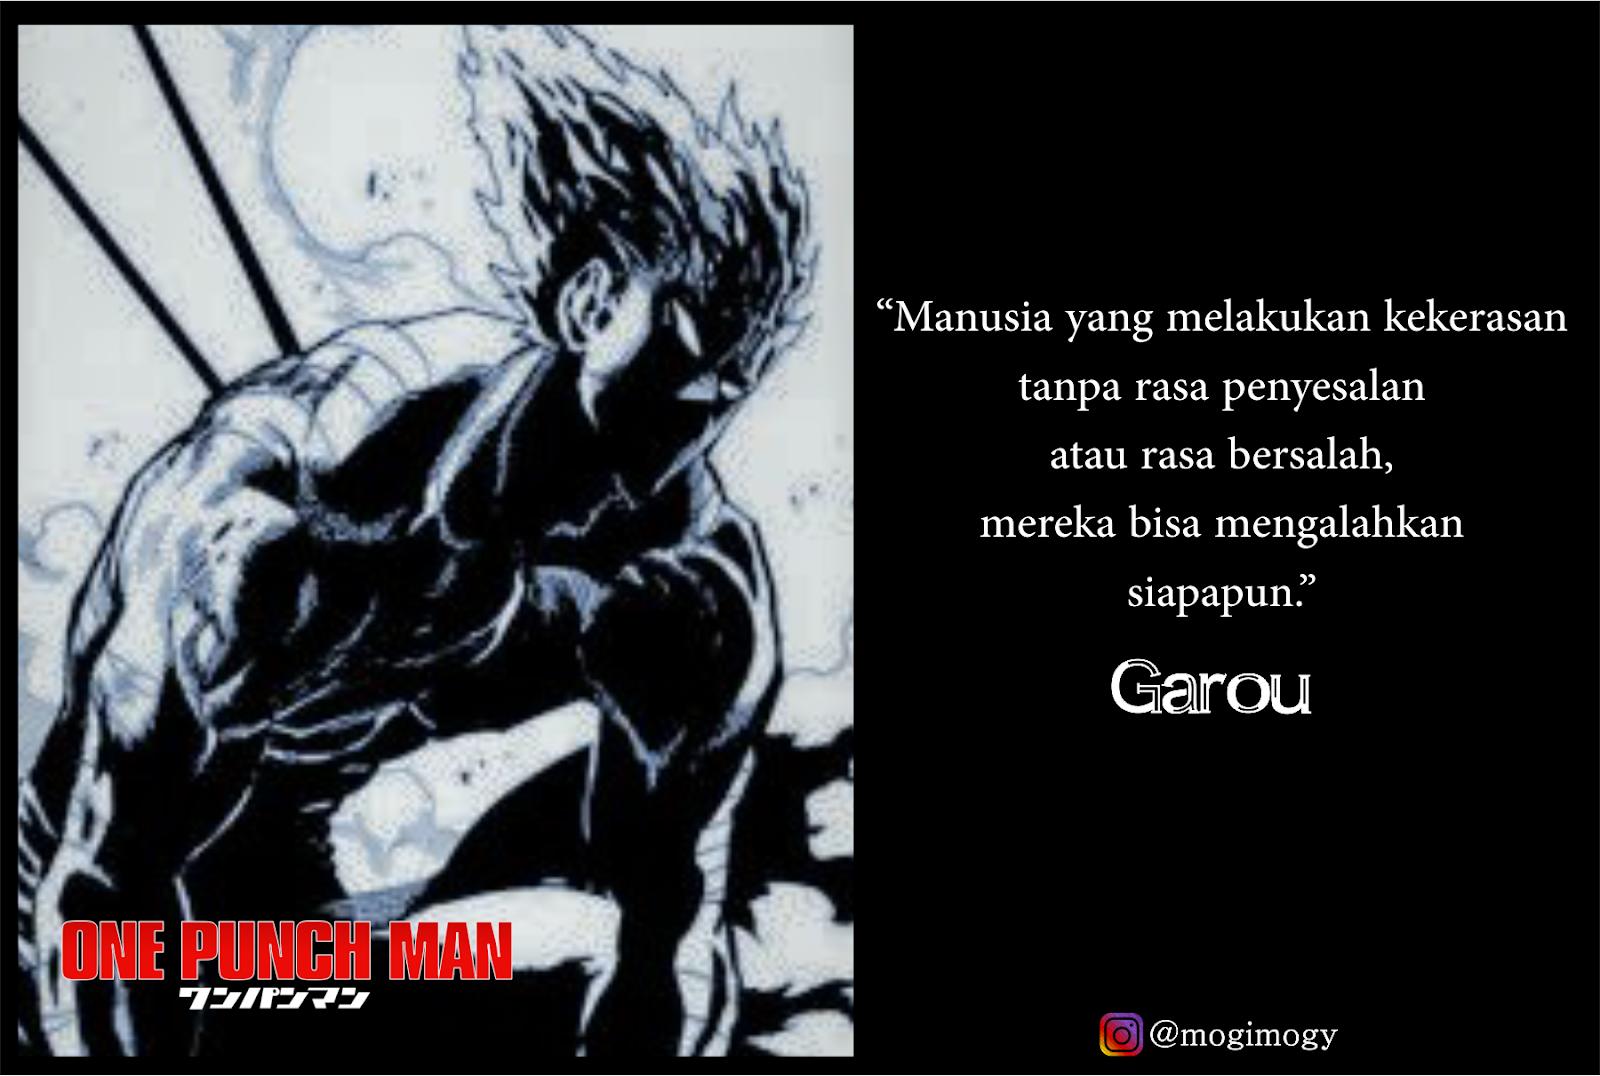 Garou One Punch Man Quotes Dowload Anime Wallpaper Hd